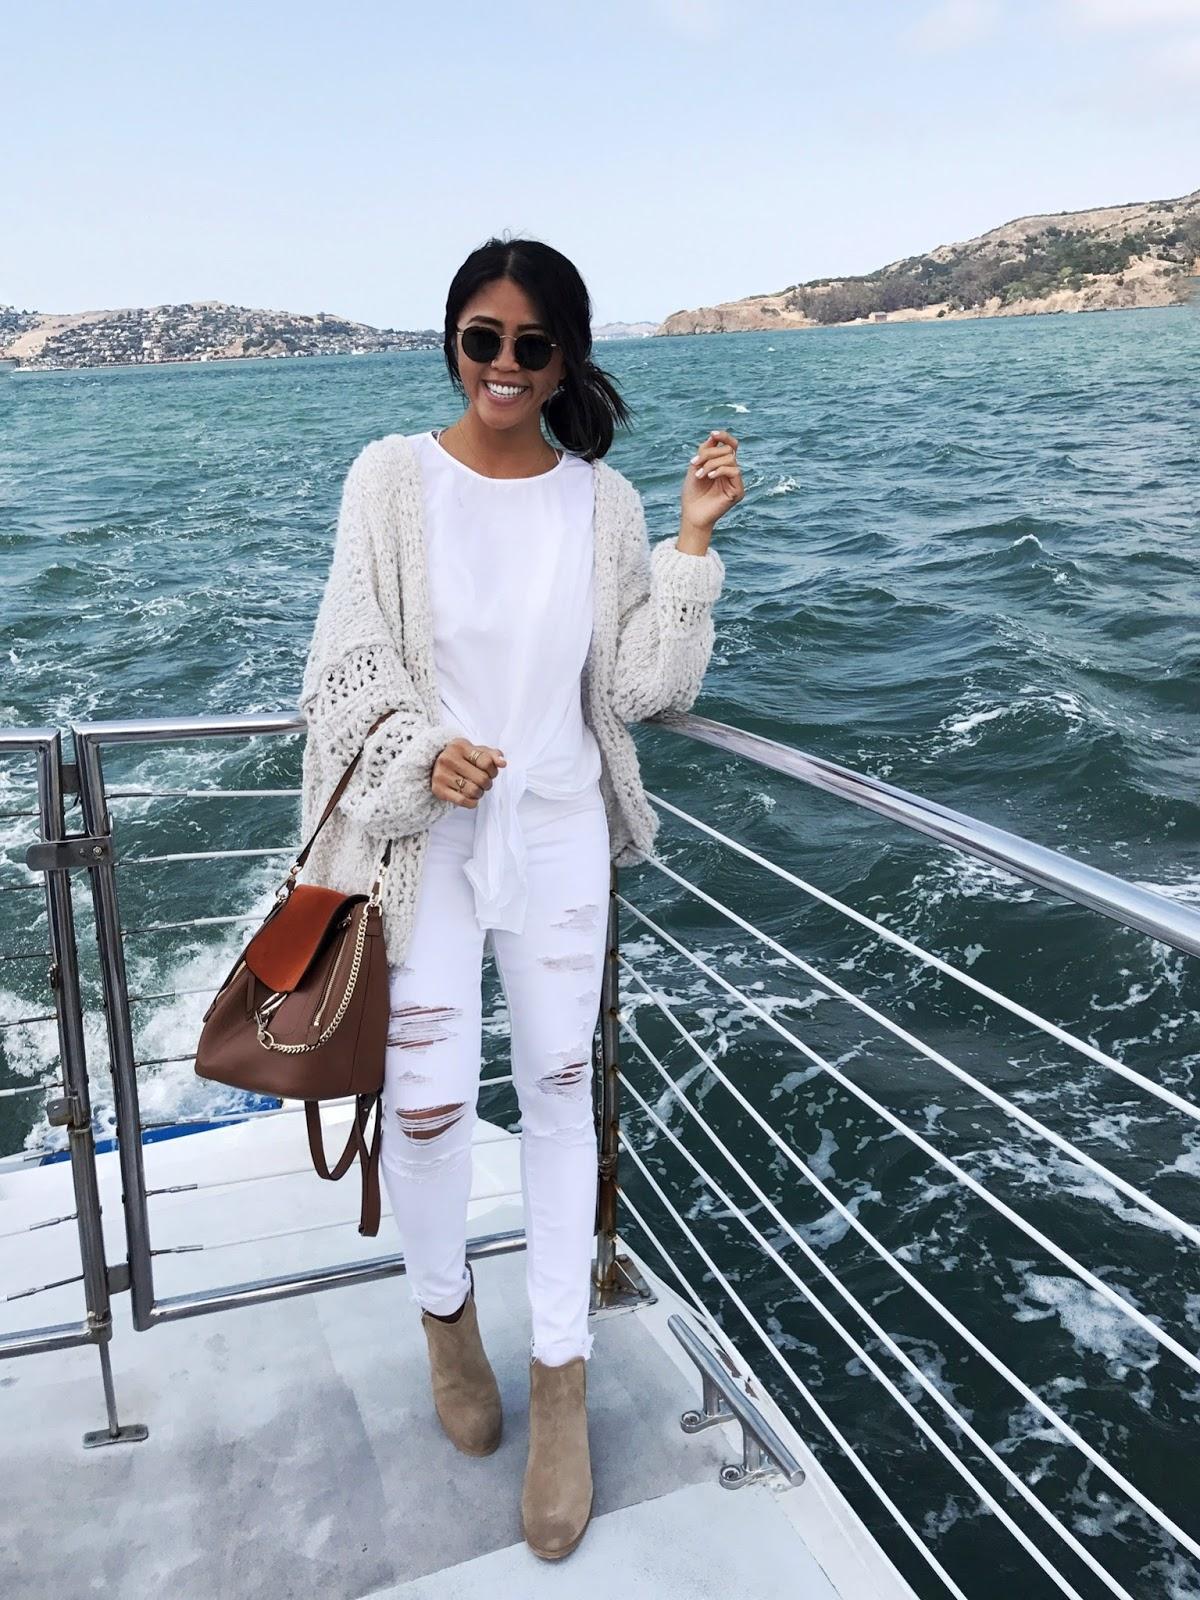 What To Do in San Francisco - Catamaran Sailing | Gypsy Tan